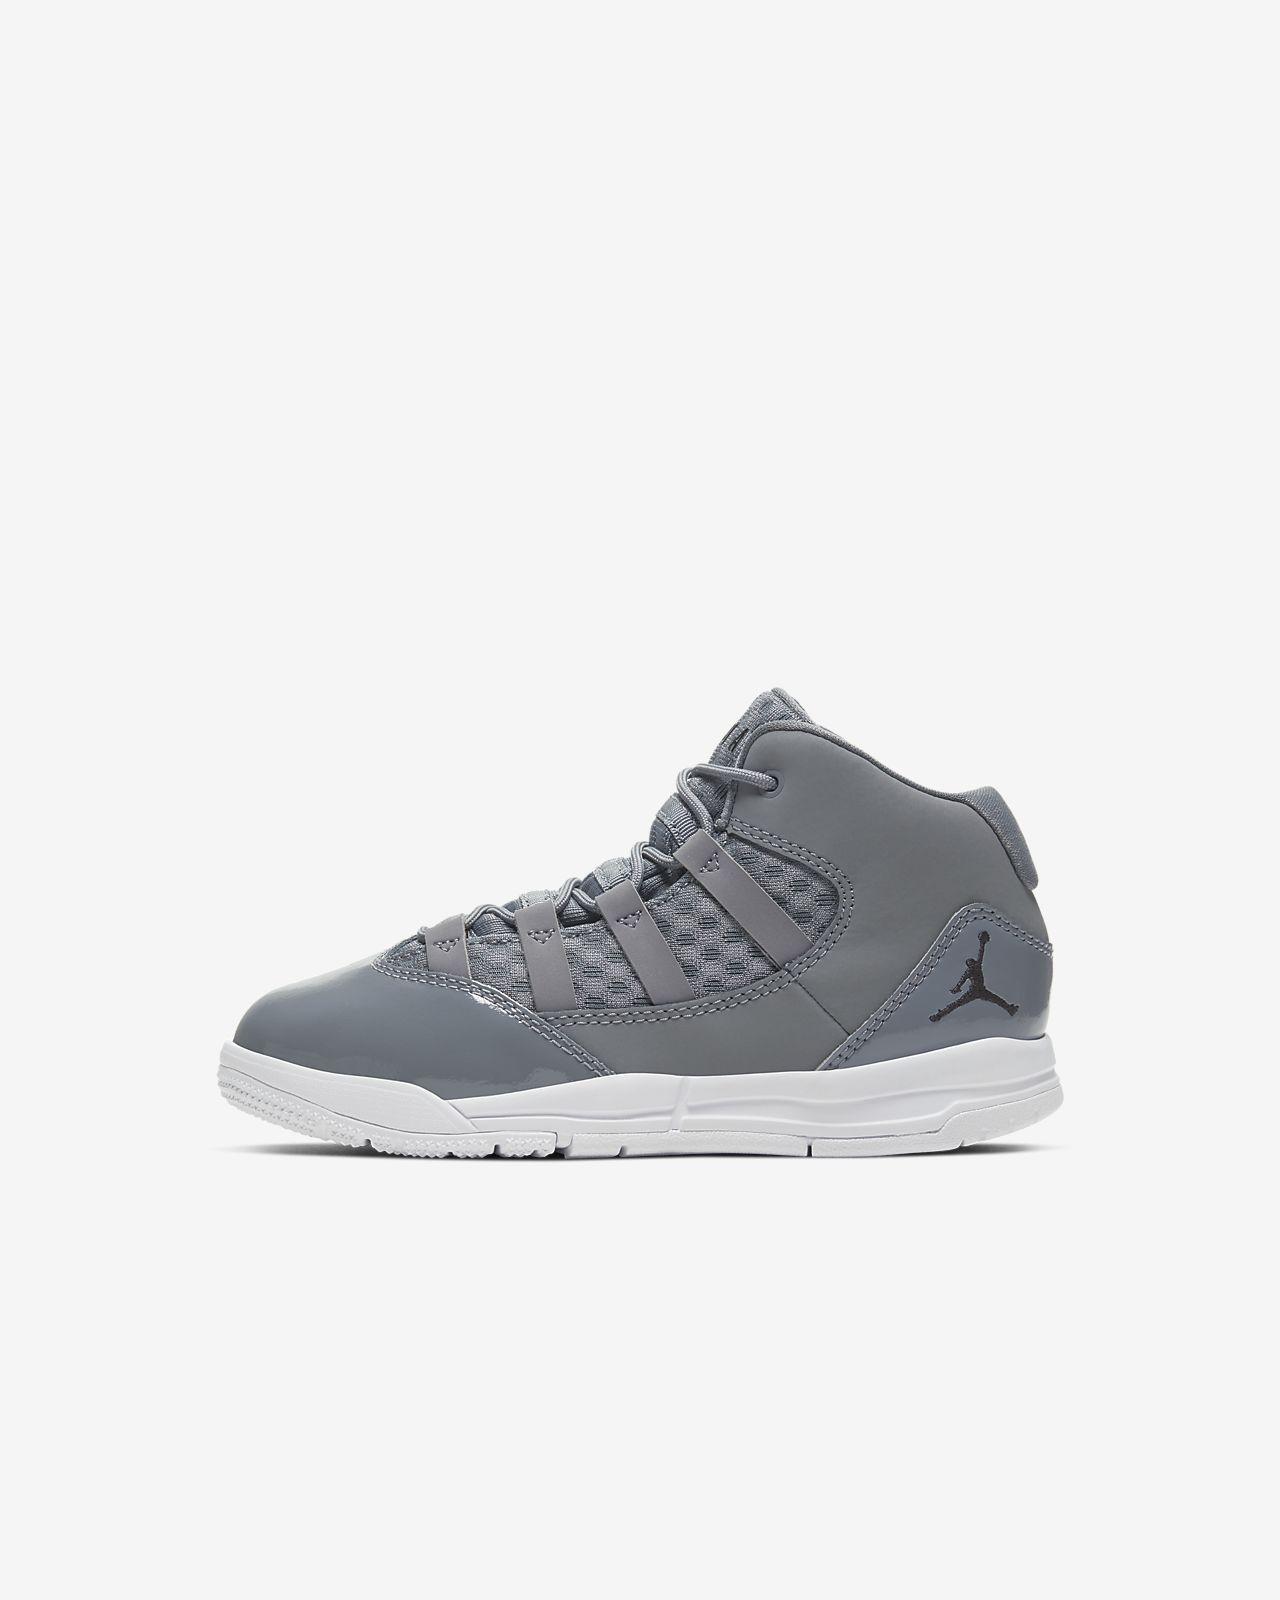 nike de max chaussures aura basketball enfant jordan TFcK1Jl